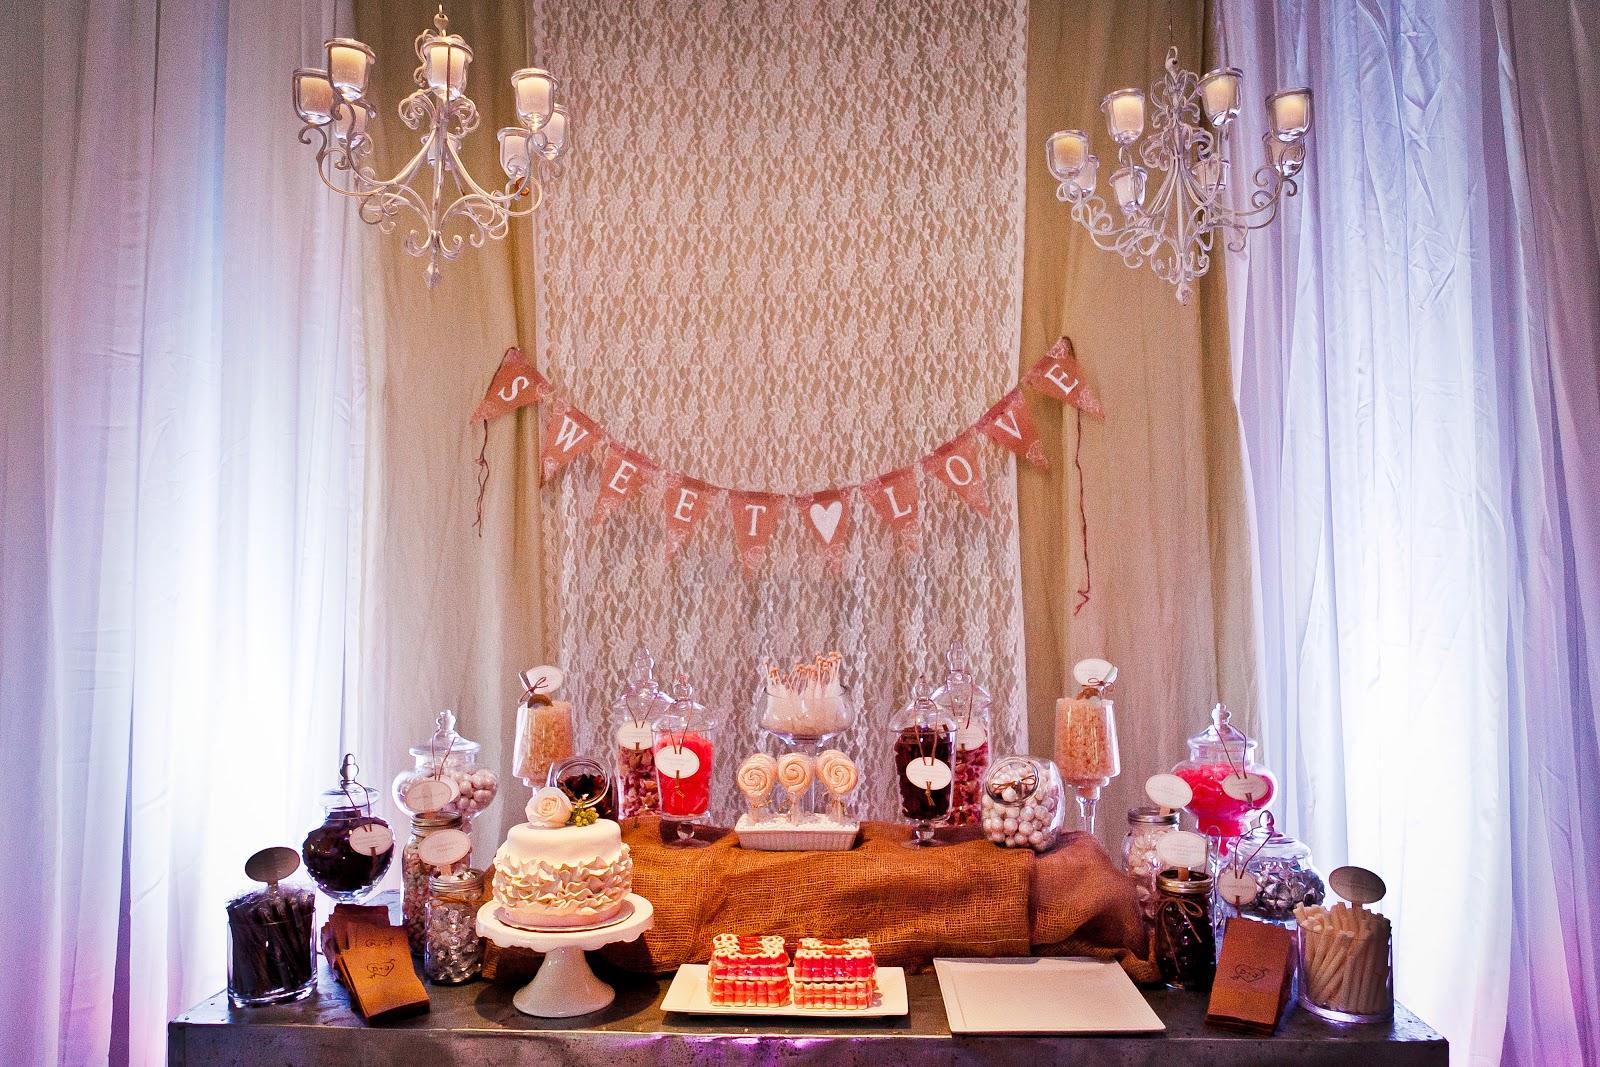 LITTLE FLOWER SHOP - Wedding - Florals - Decor - Rentals - Events ...